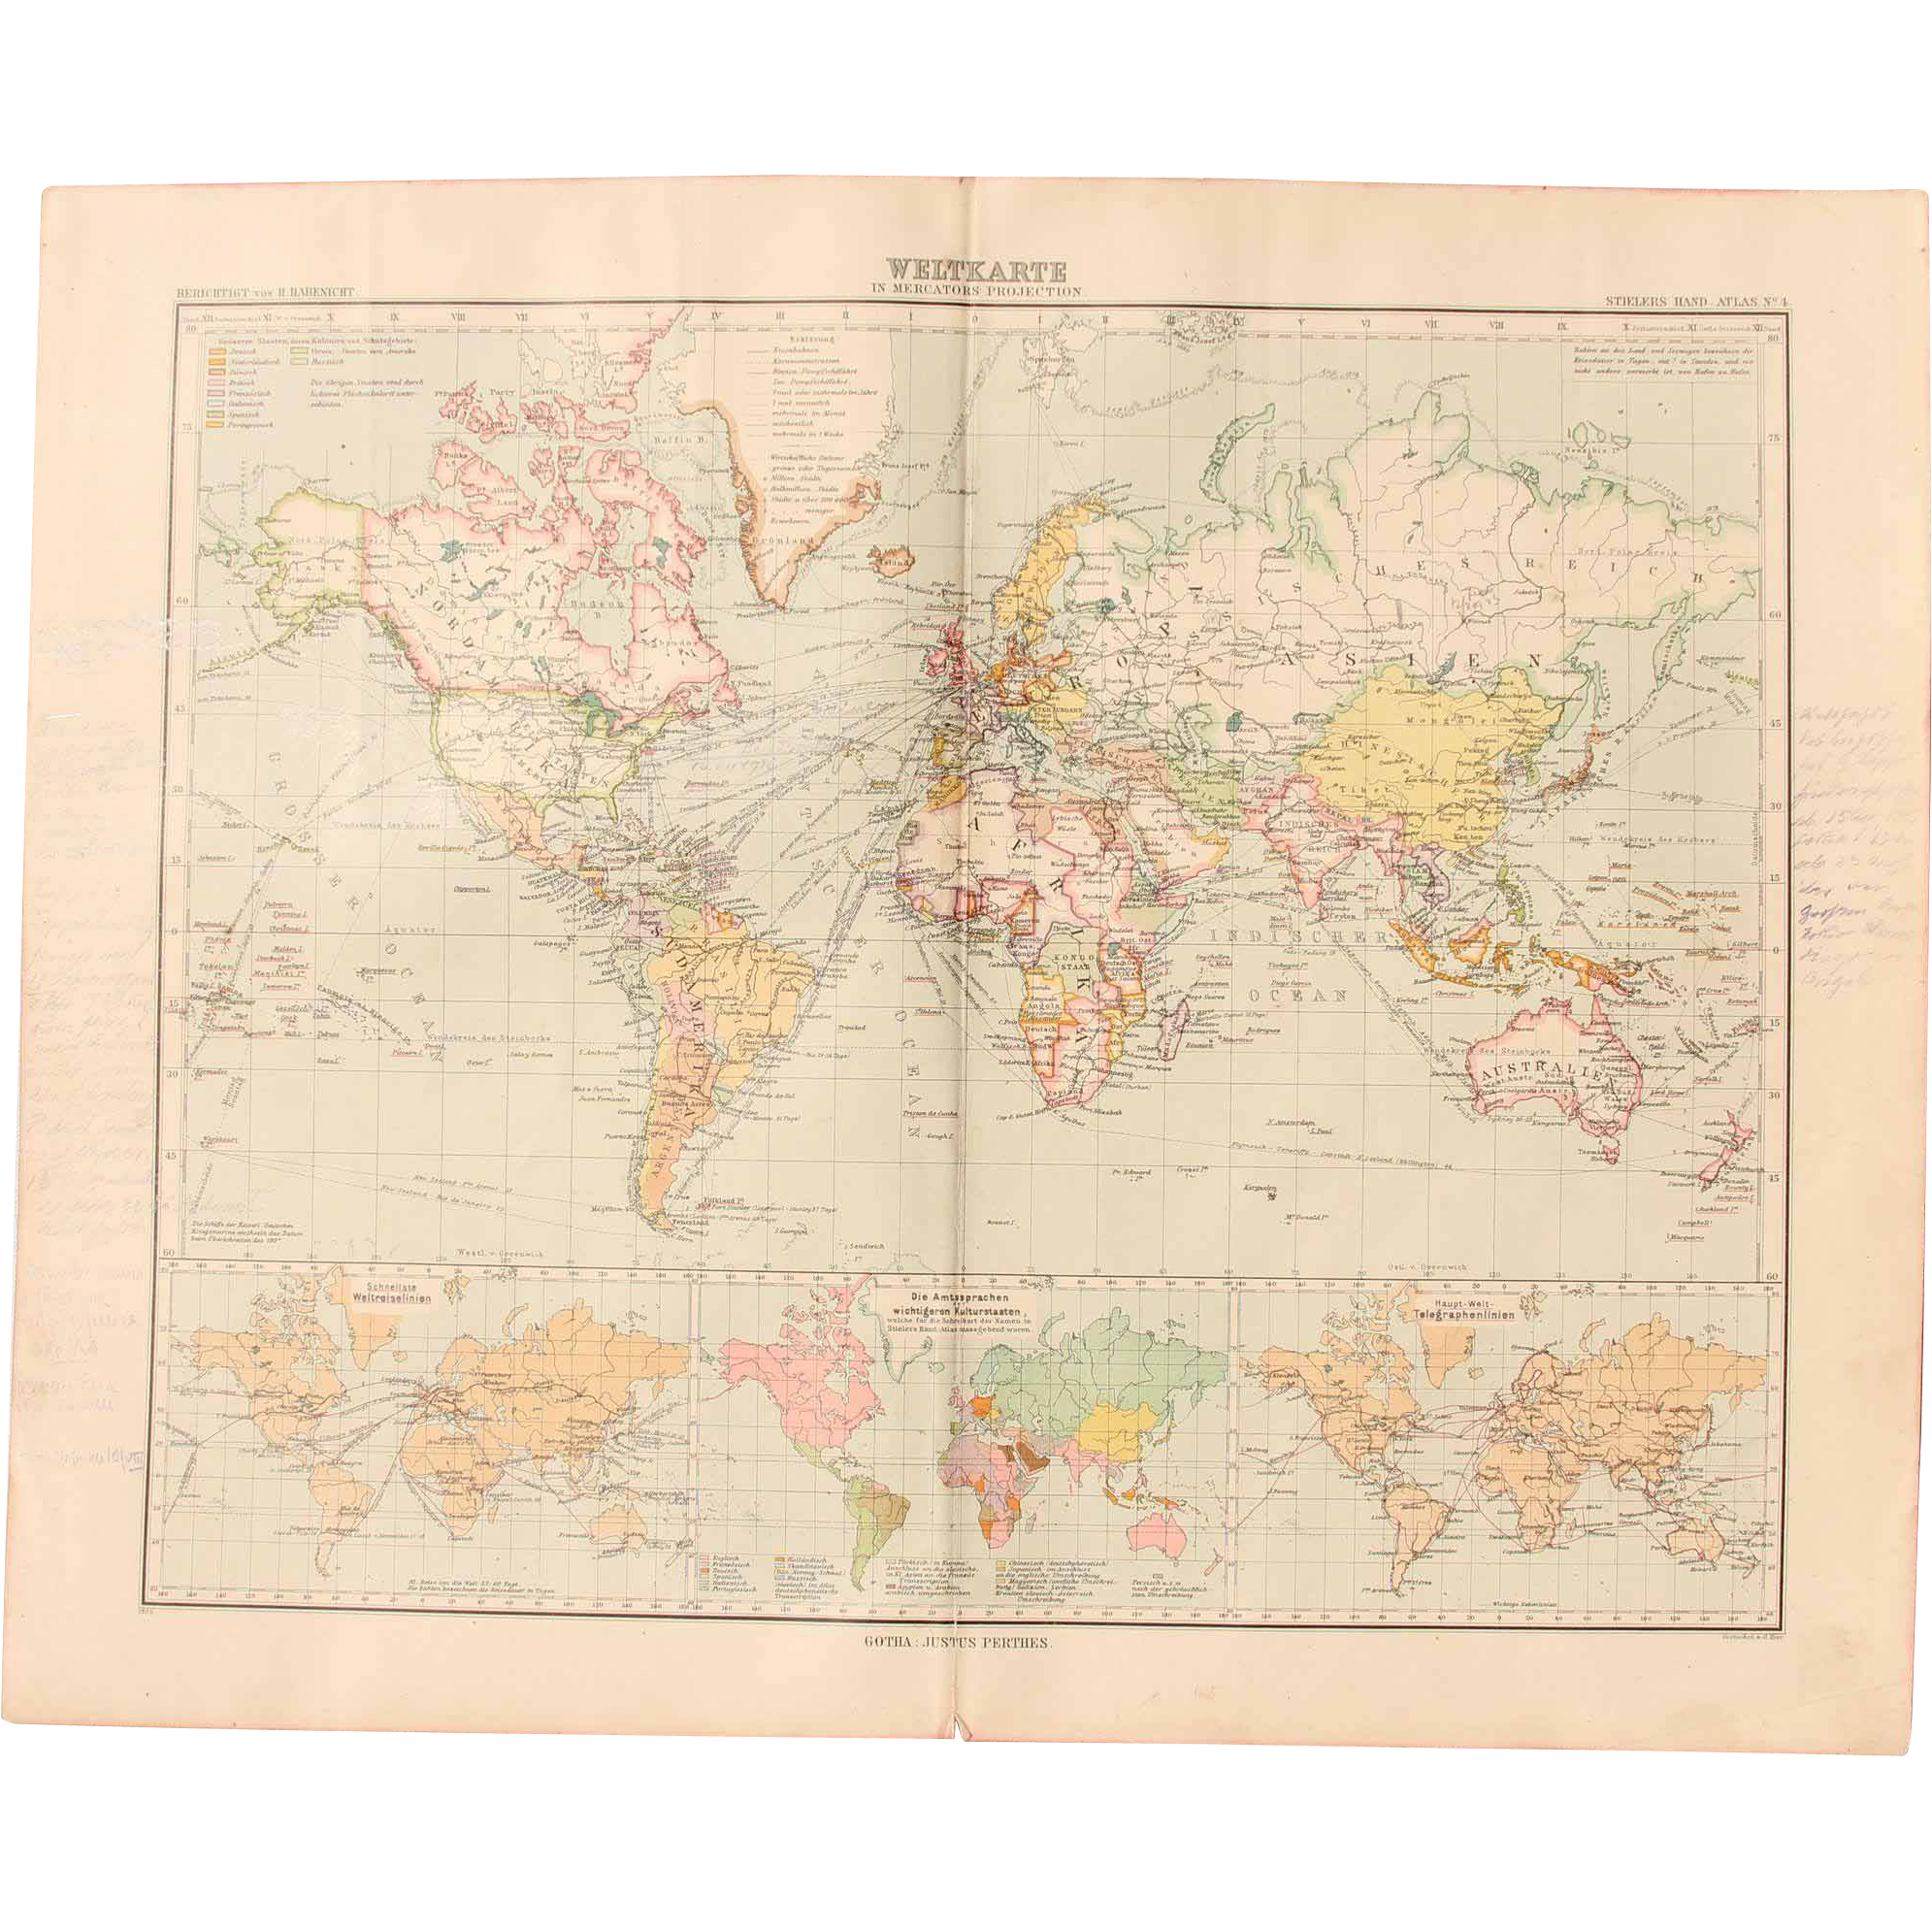 Art nouveau map of the world world map stieler 1905 vianova art nouveau map of the world world map stieler 1905 vianova ruby lane gumiabroncs Gallery